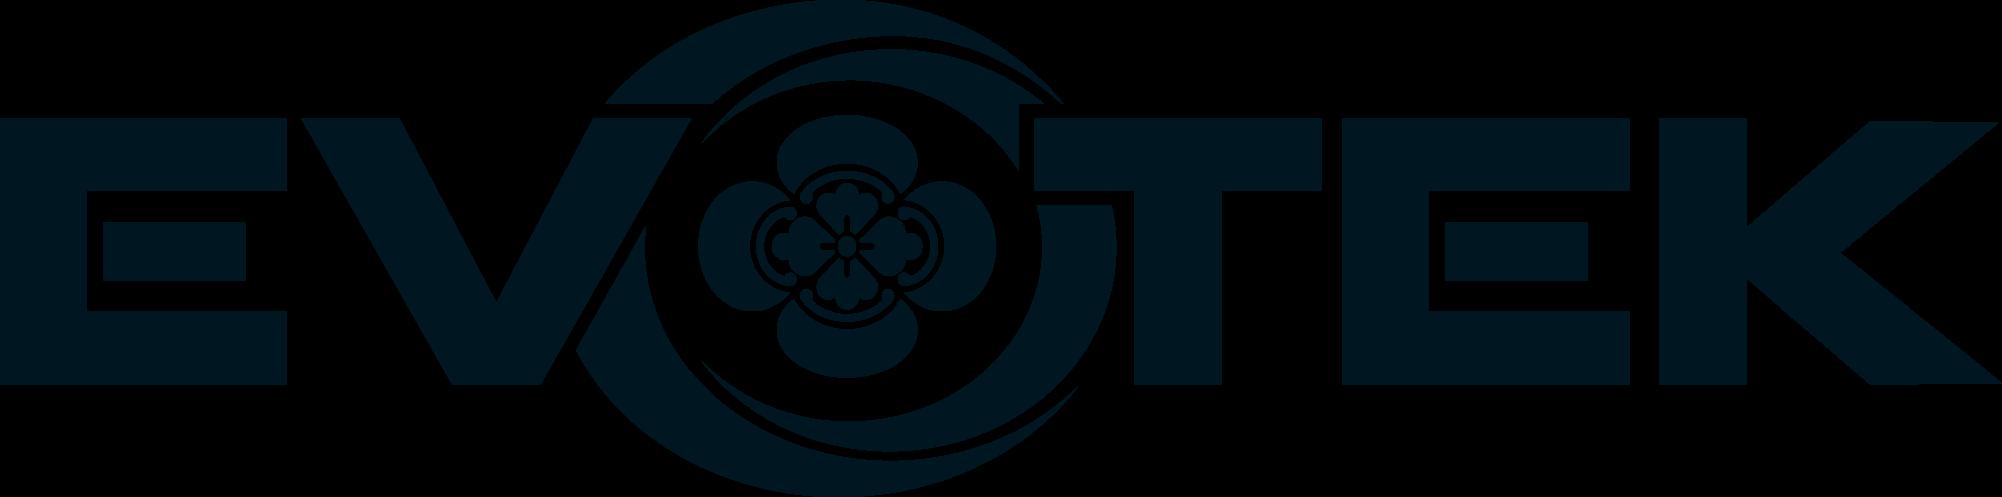 EVOTEK, Inc. logo